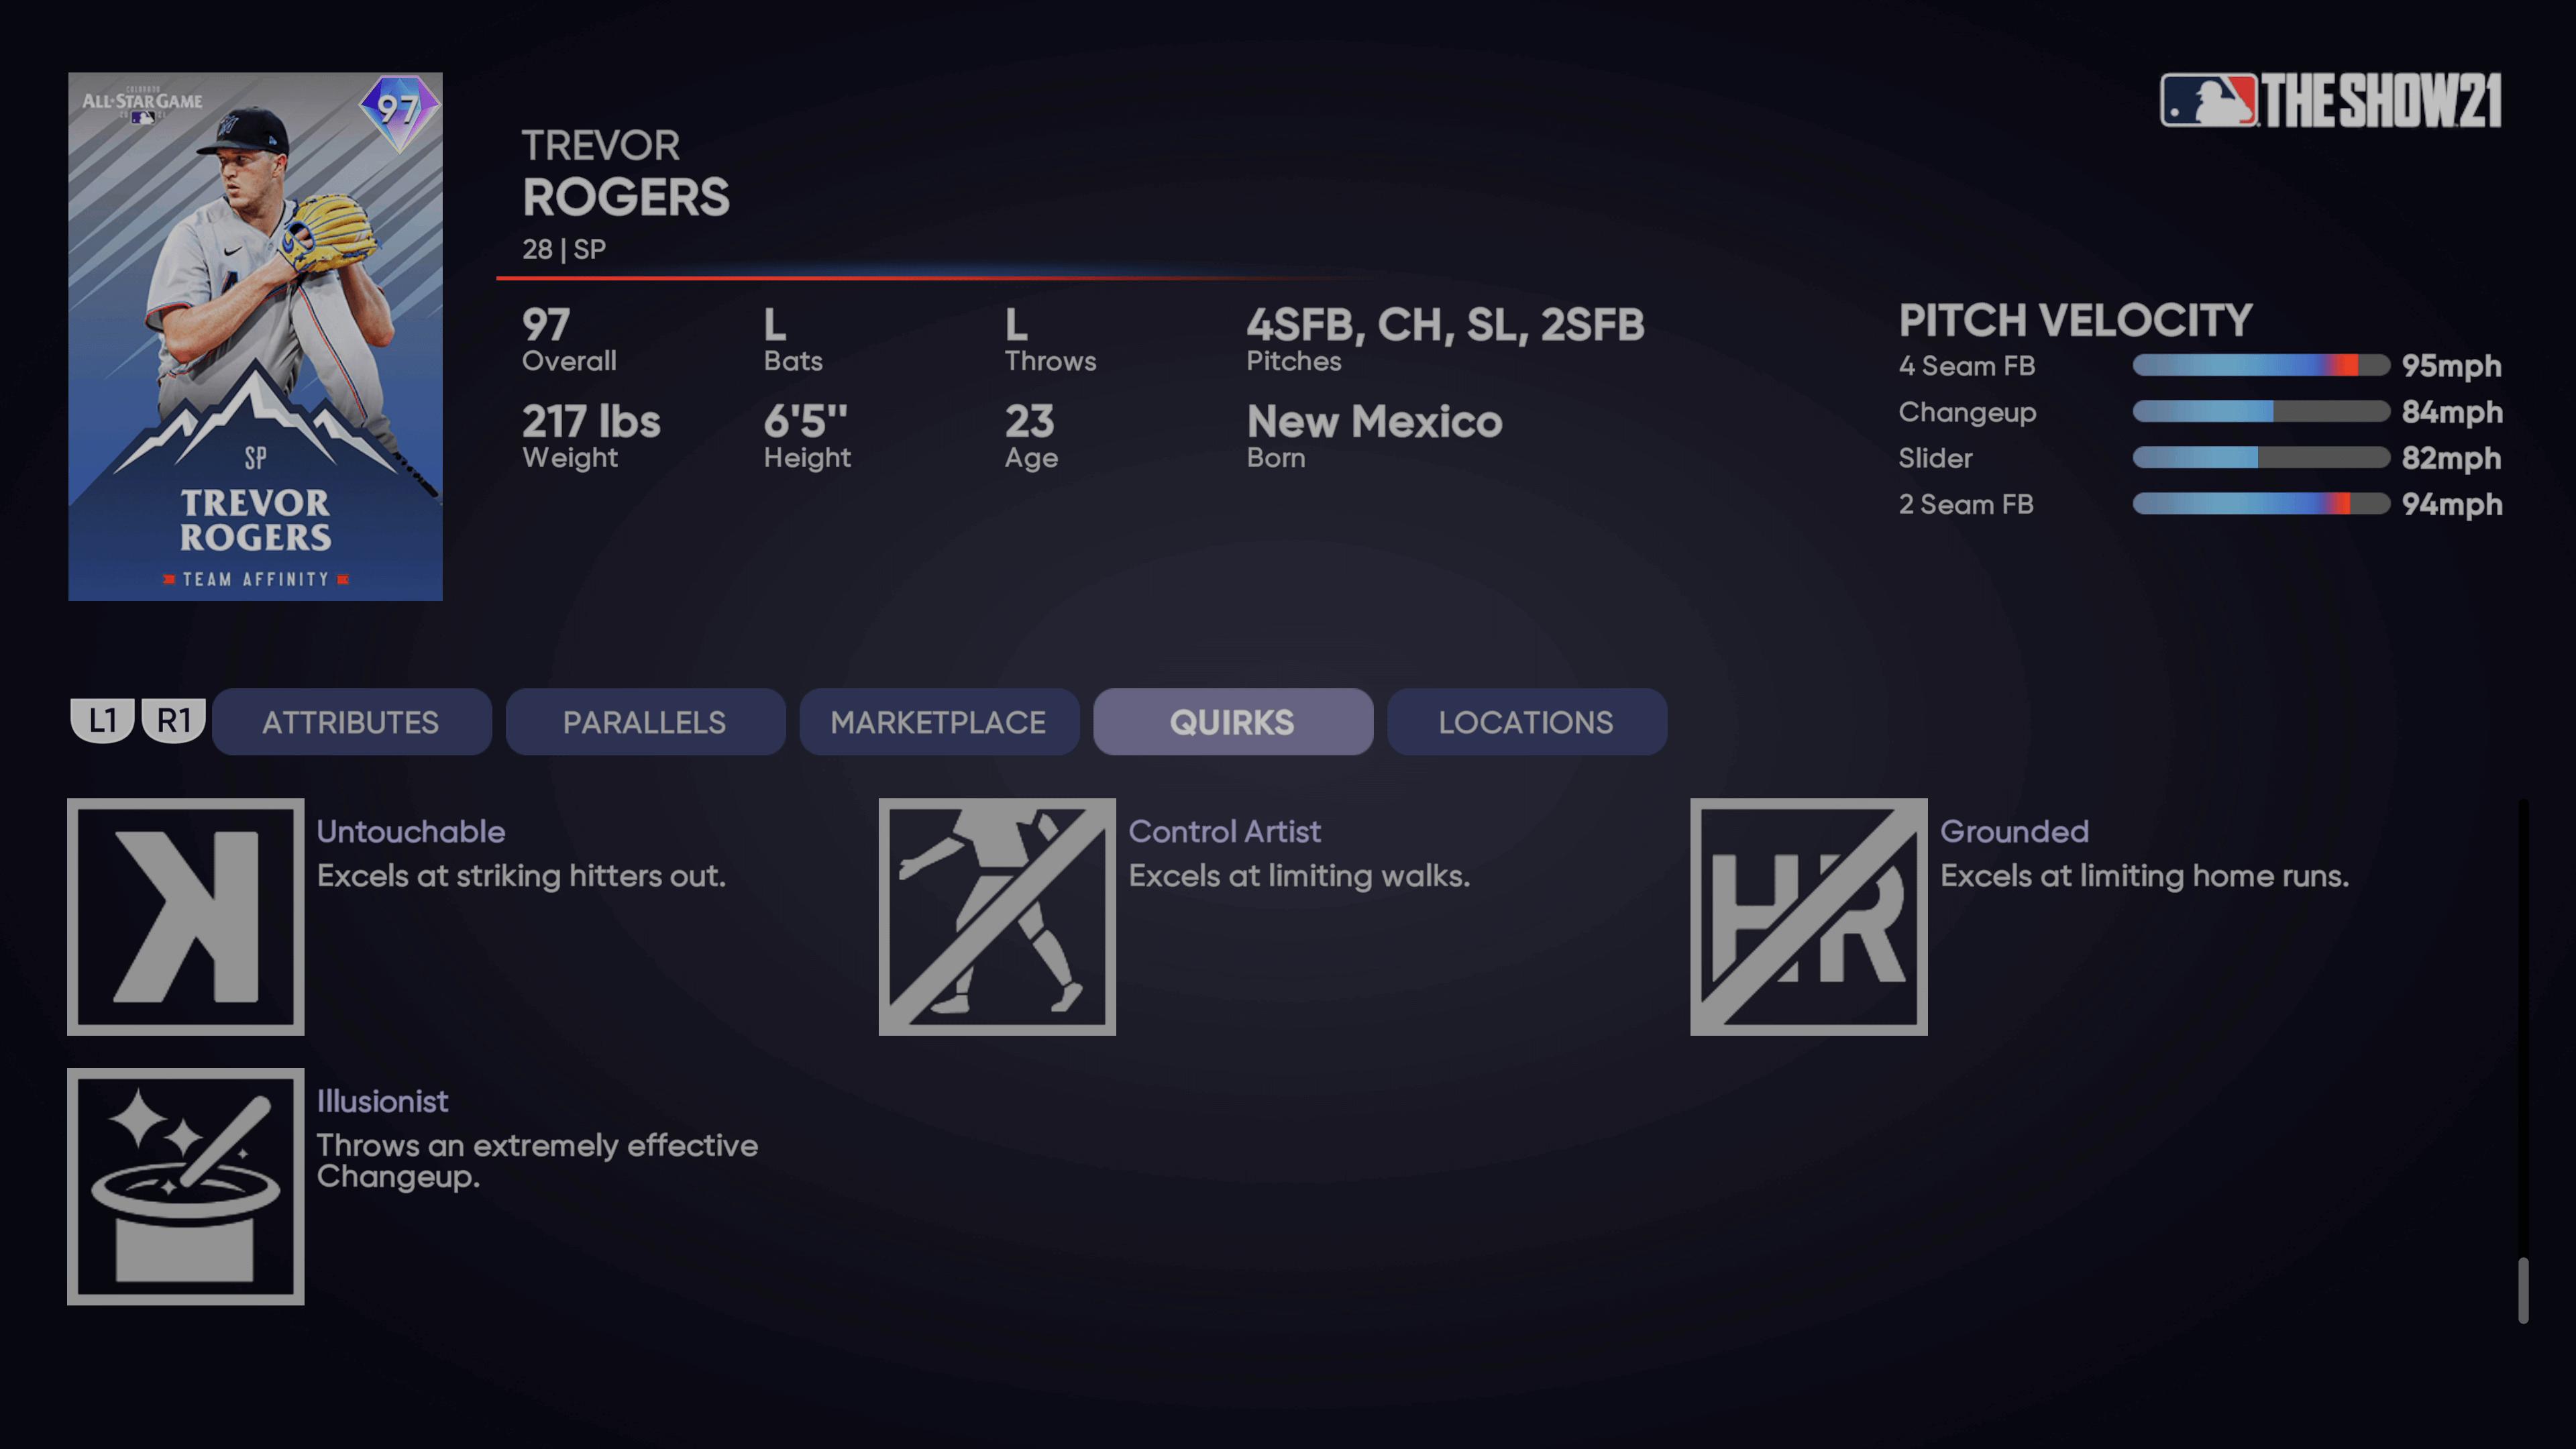 MLB The Show 21 - Team Affinity Season 3_2021-07-12_15-18-19